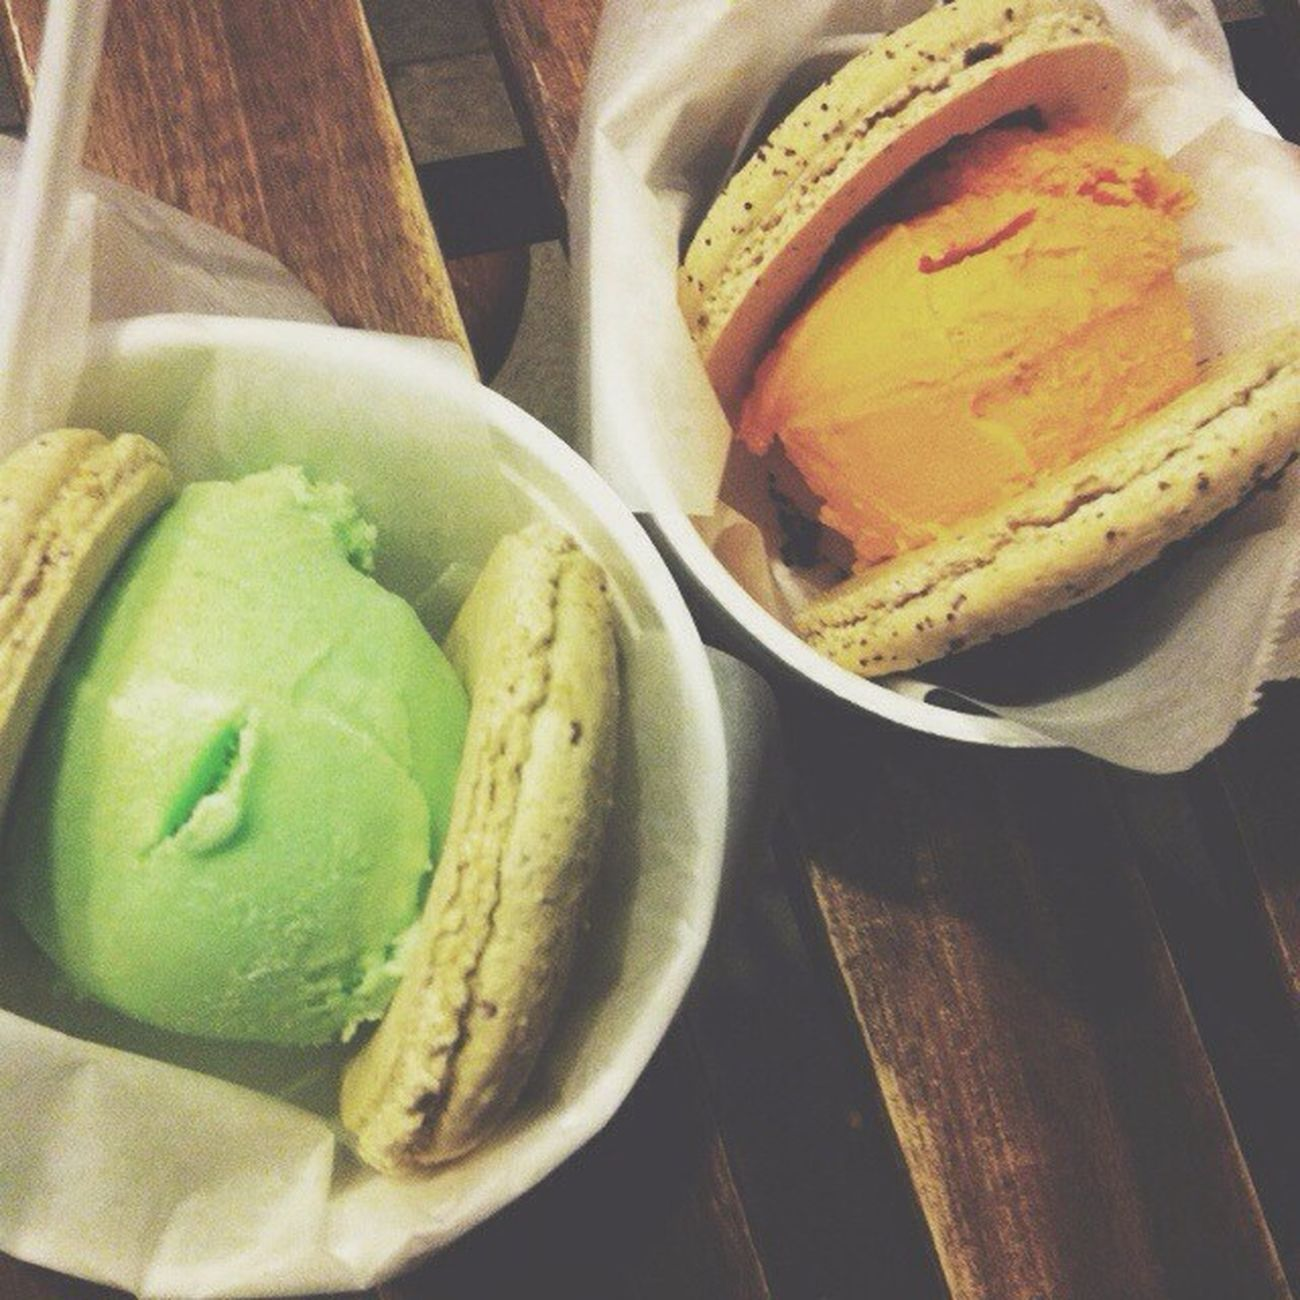 Ice cream macaroon FTW! ?? Greenteamacaroonwithpistachioicecream Oreomacaroonwiththaiteaicecream Snowmonster Yummers noms fattyforever